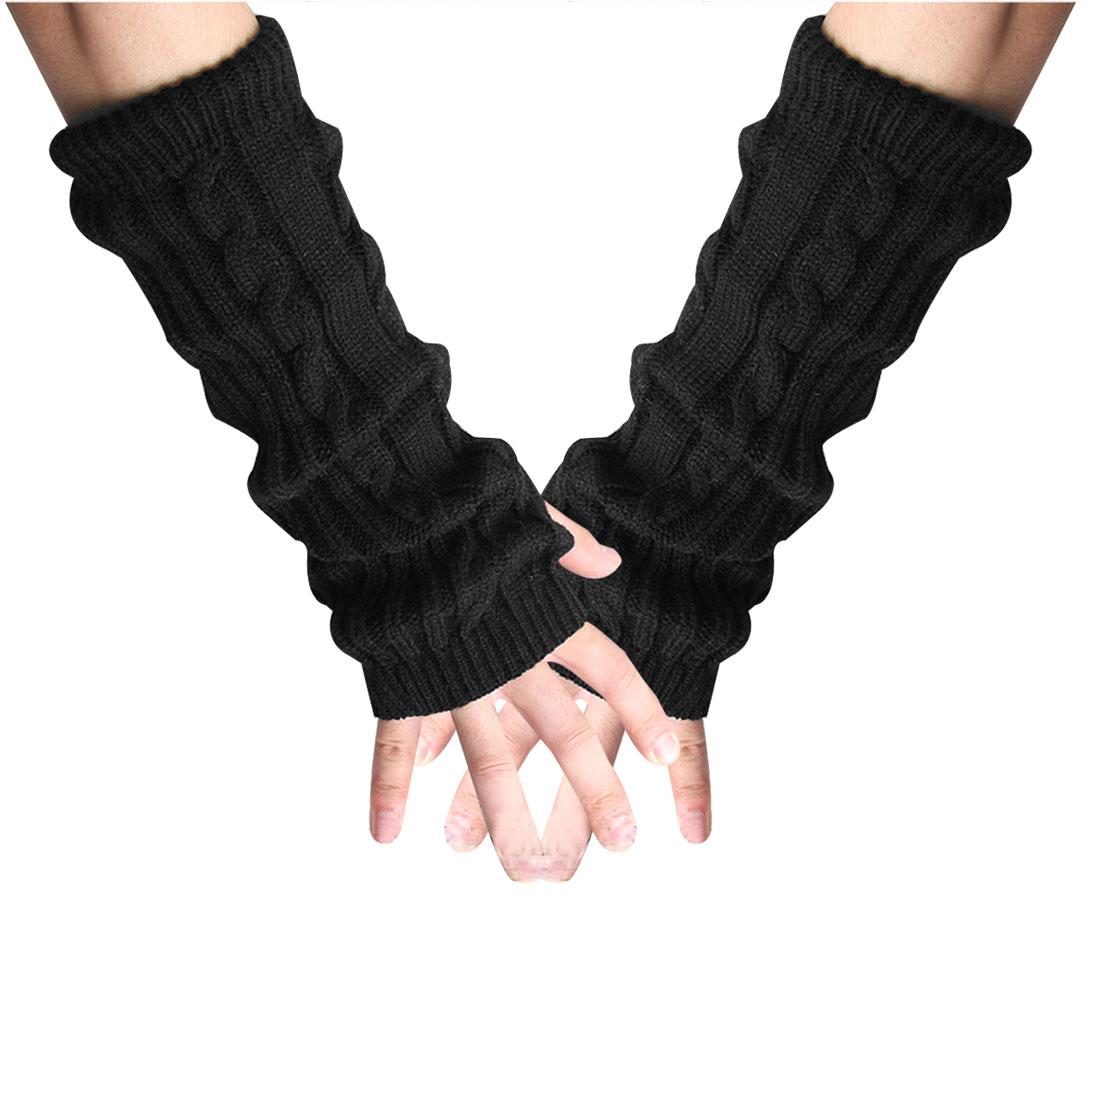 Tasharina Men's Textured Ribbing Hem Design Long Stretch Thick Gloves Black